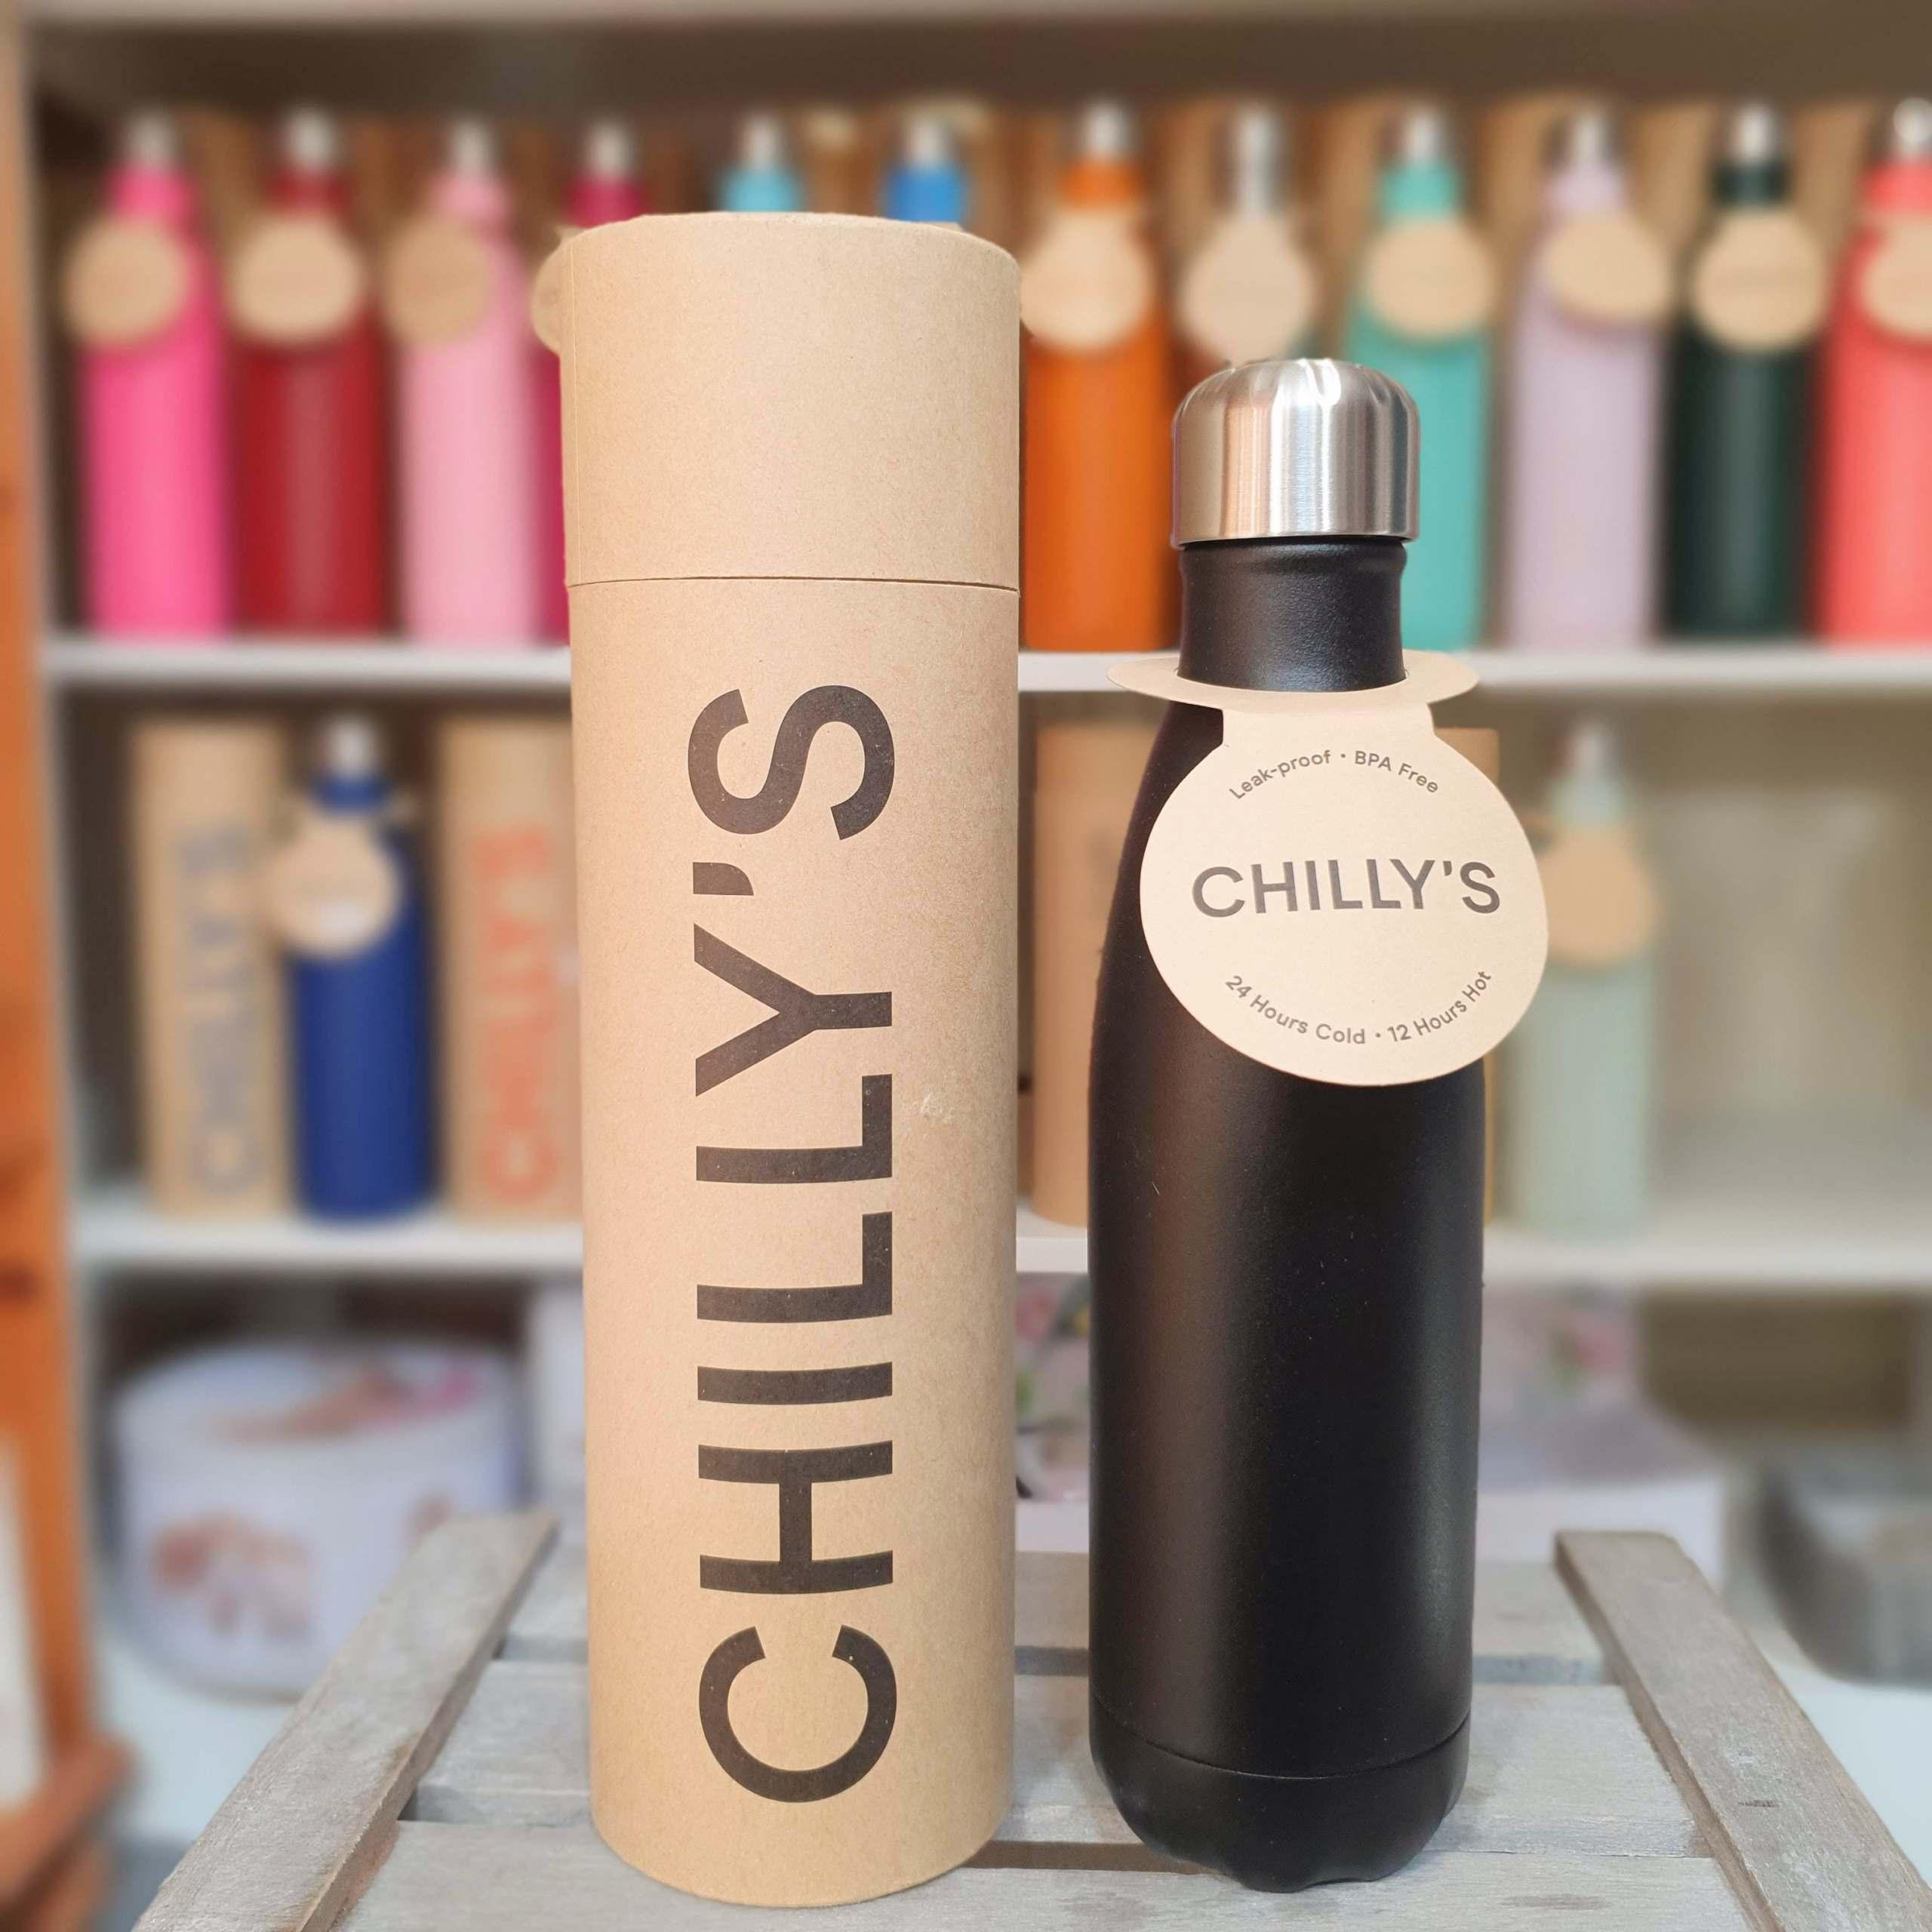 Large Black Chilly's Bottle